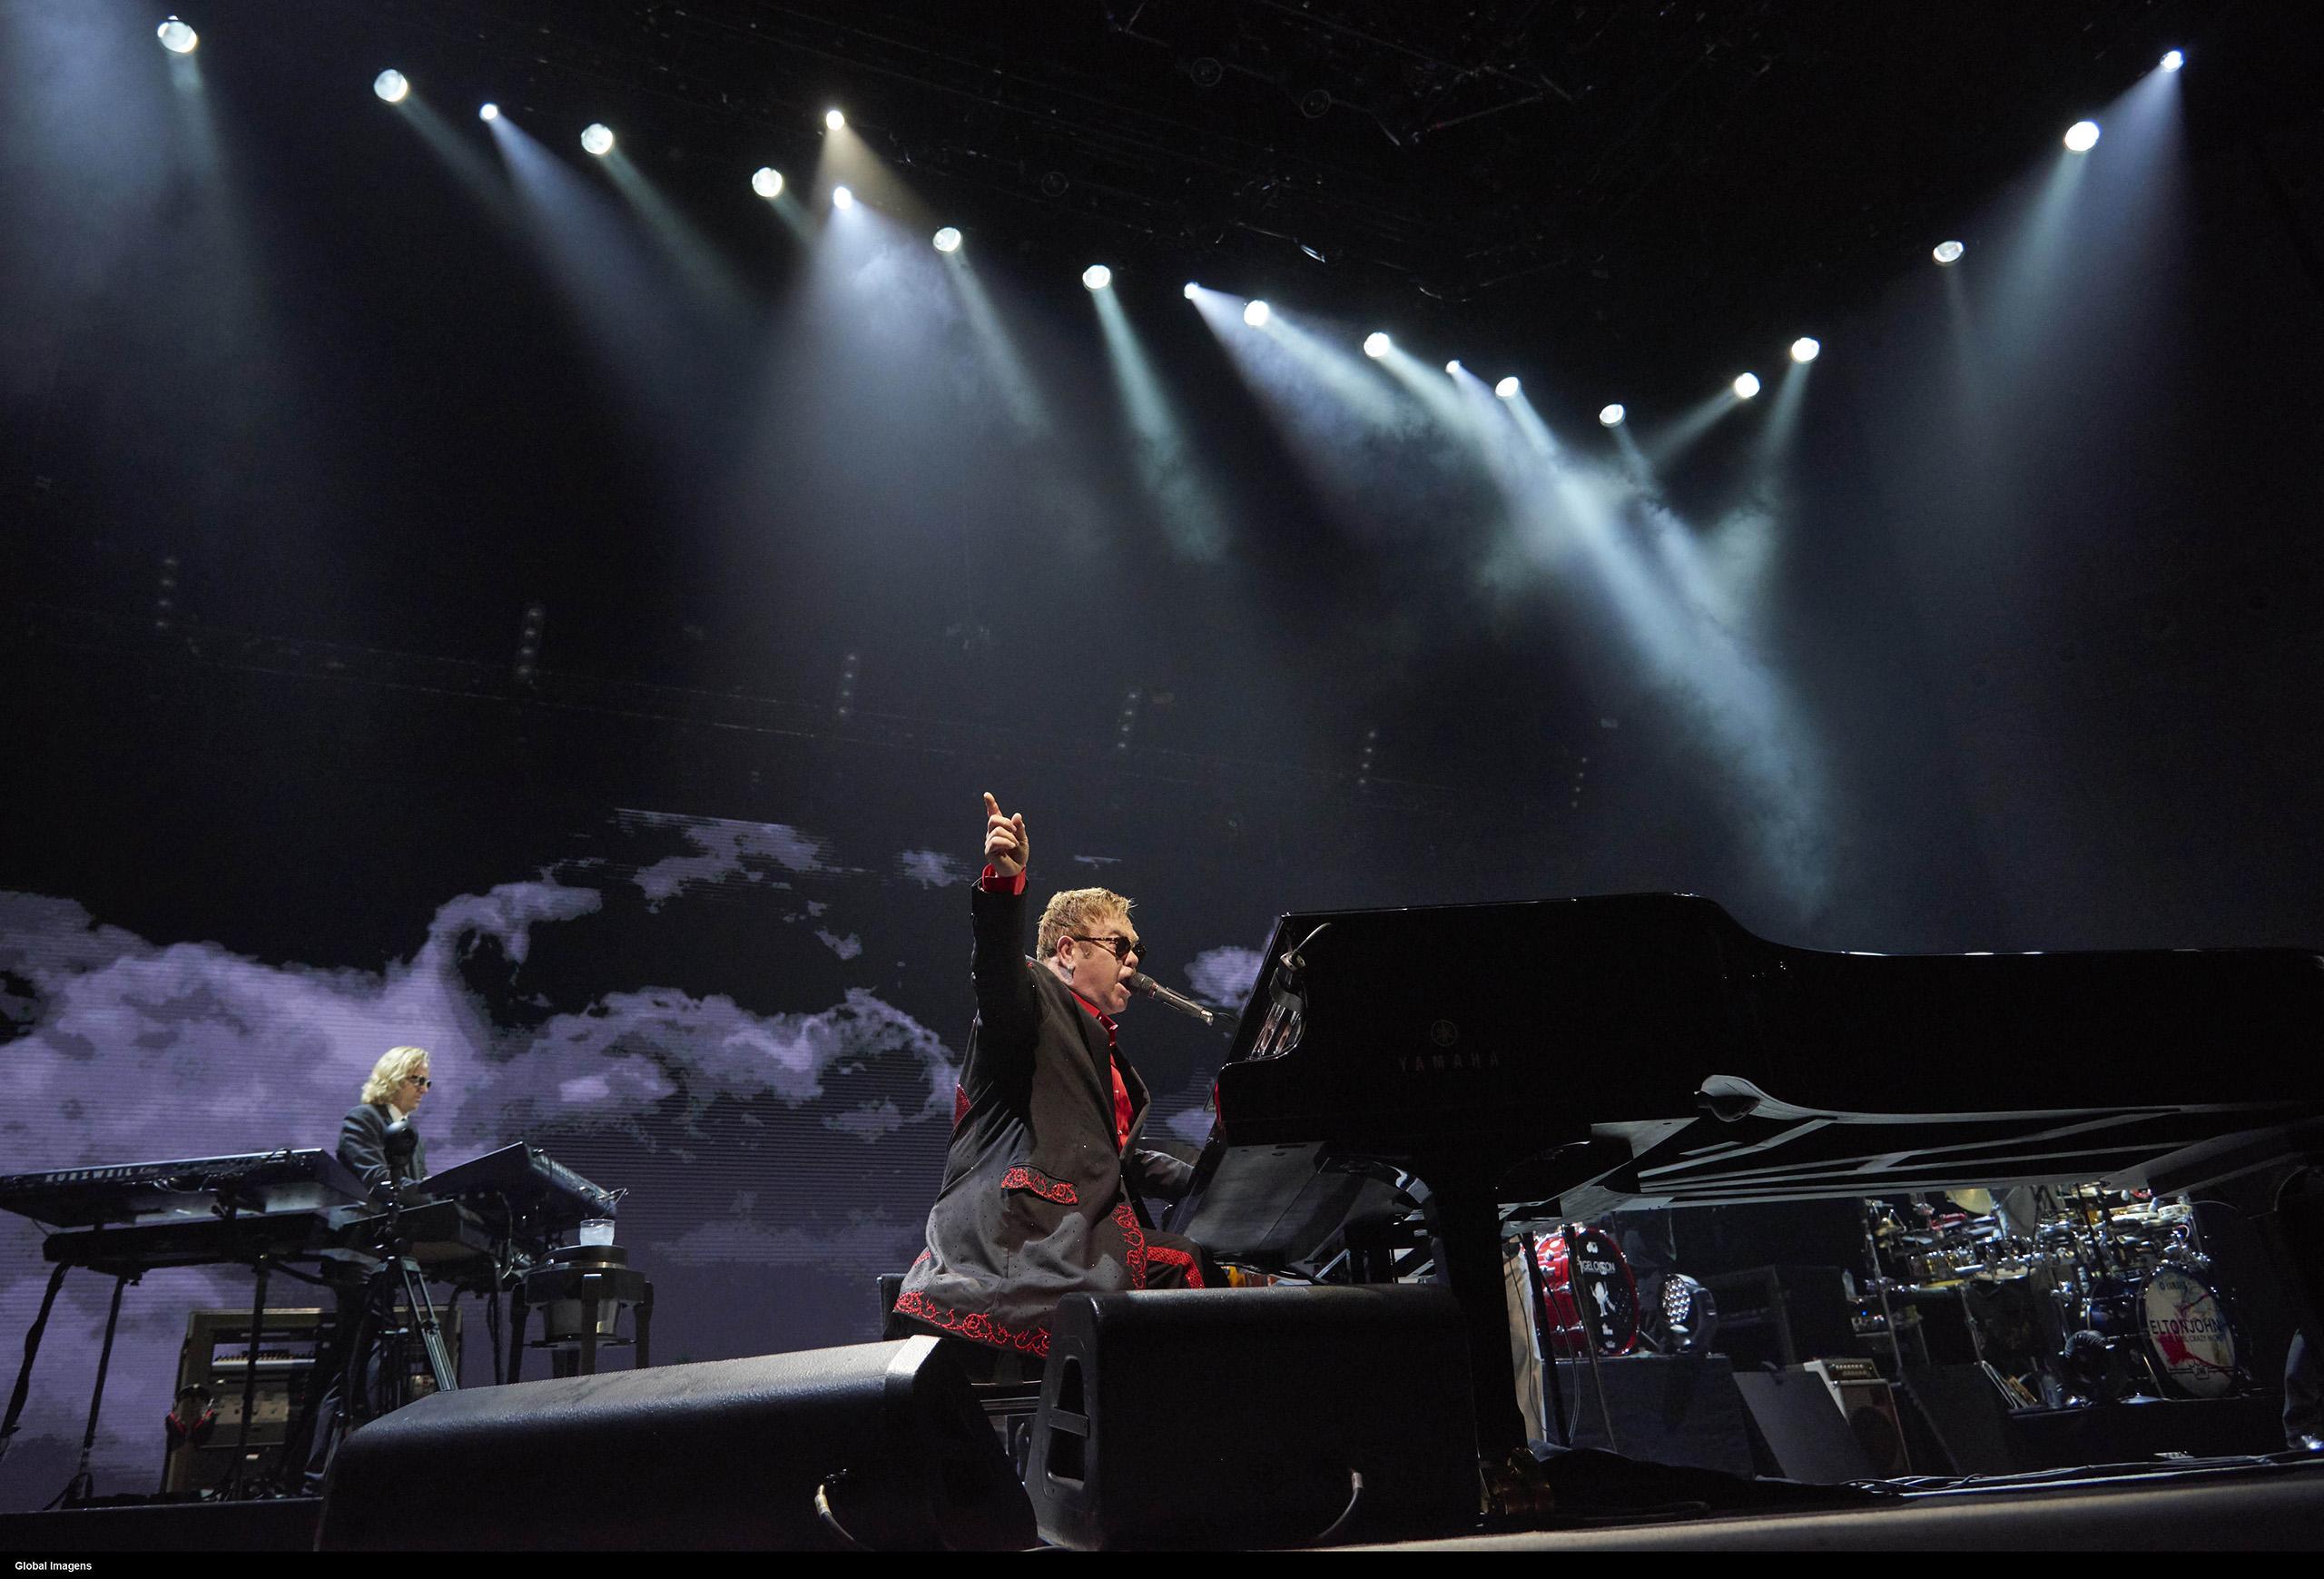 Elton John in concert in Meo Arena in Lisbon, Portugal on Dec. 11, 2016.